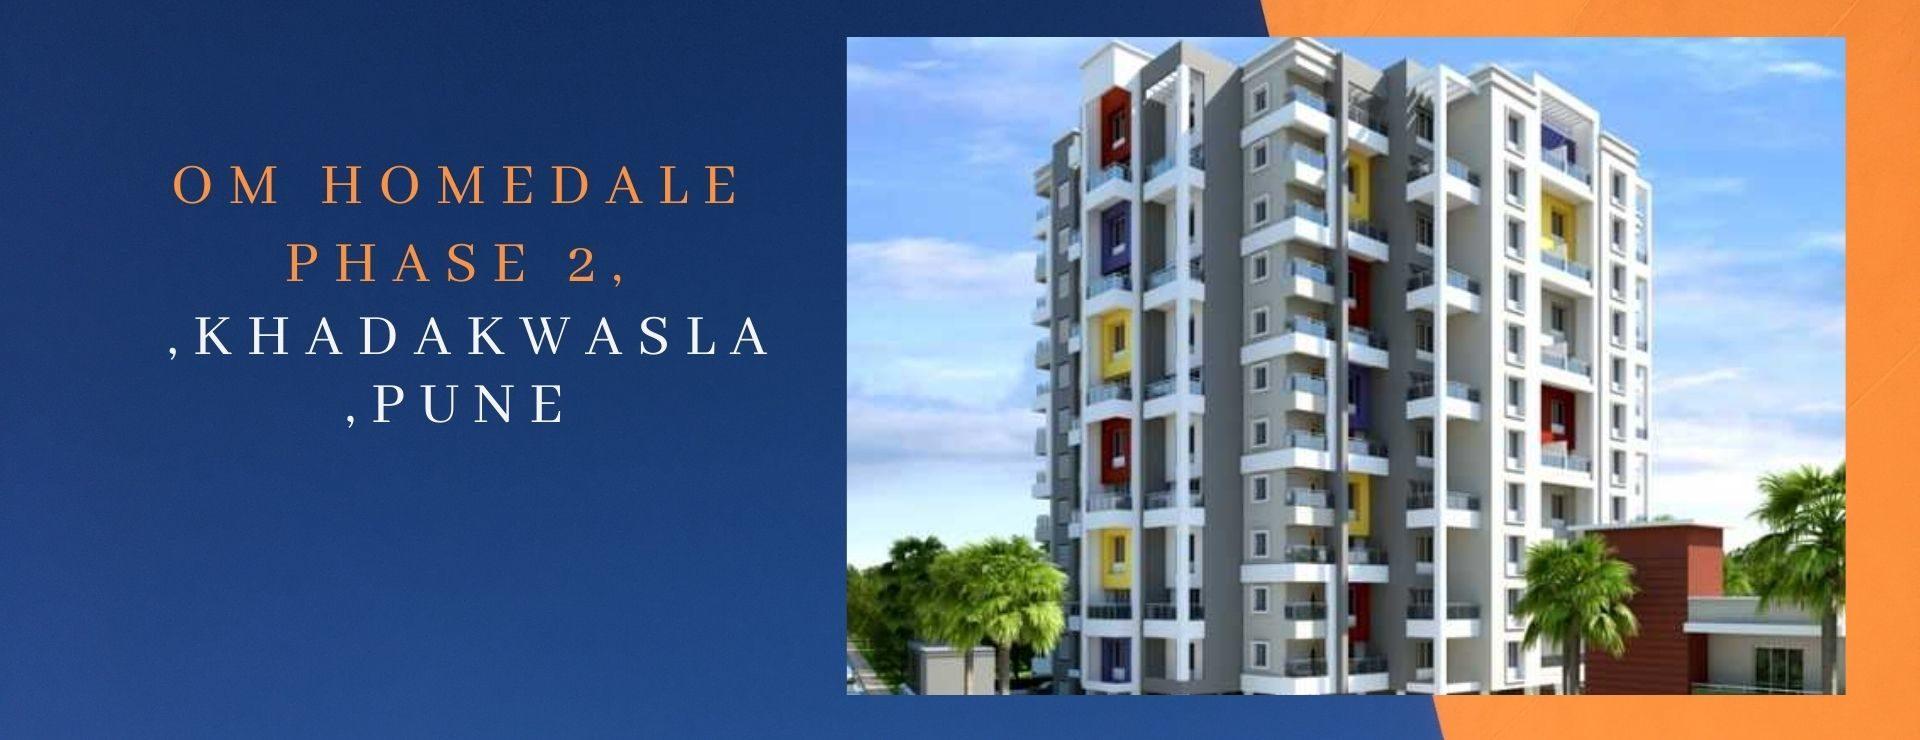 Om Homedale Phase 2,Khadakwasla,Pune